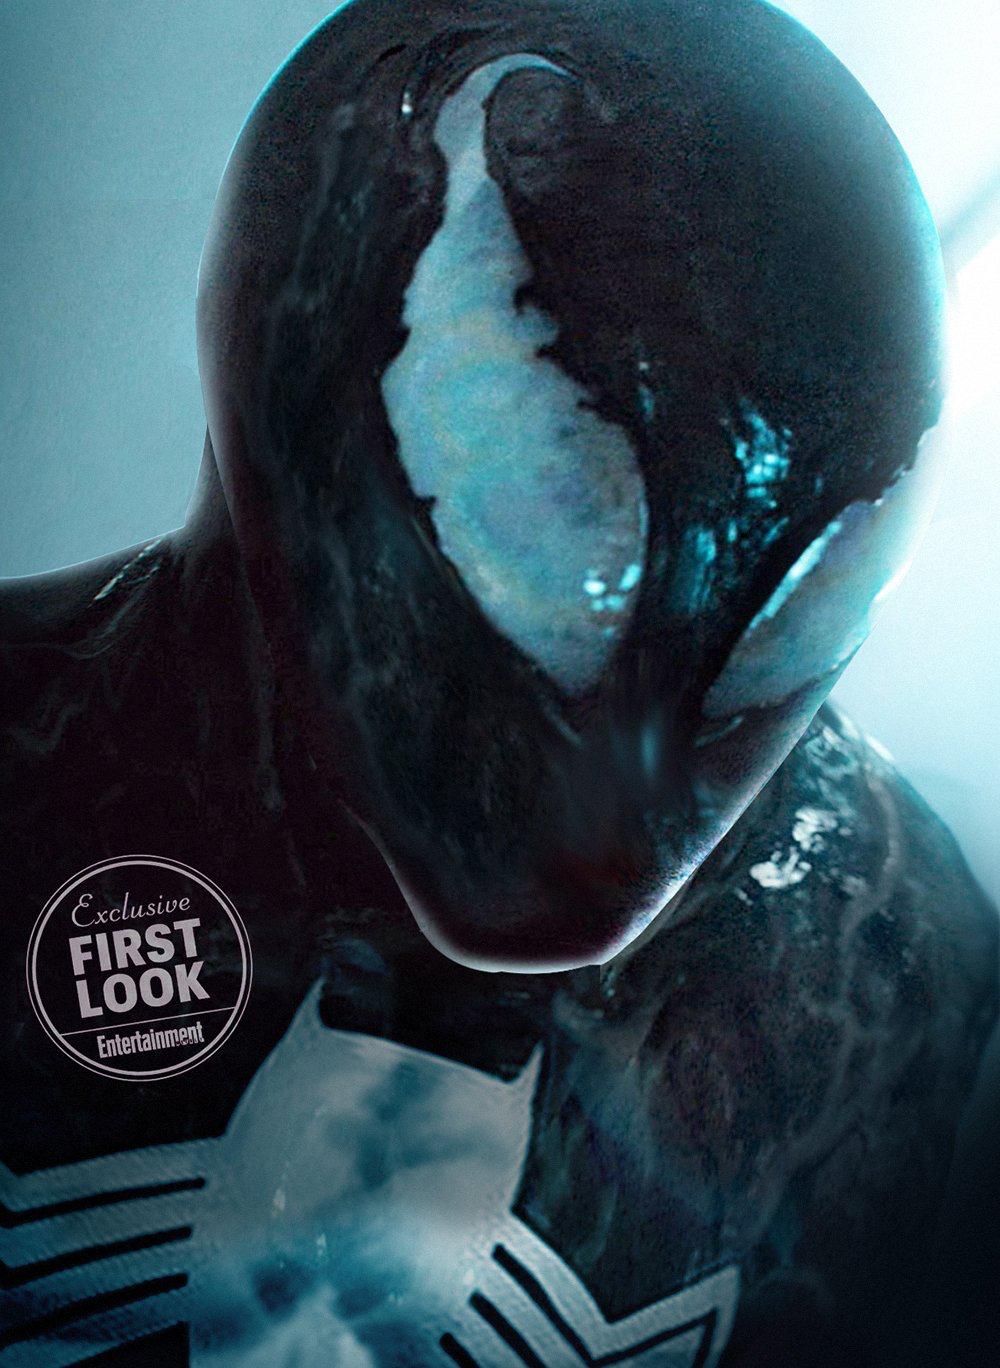 tom holland fan art as venom | watch n read | spiderman, marvel